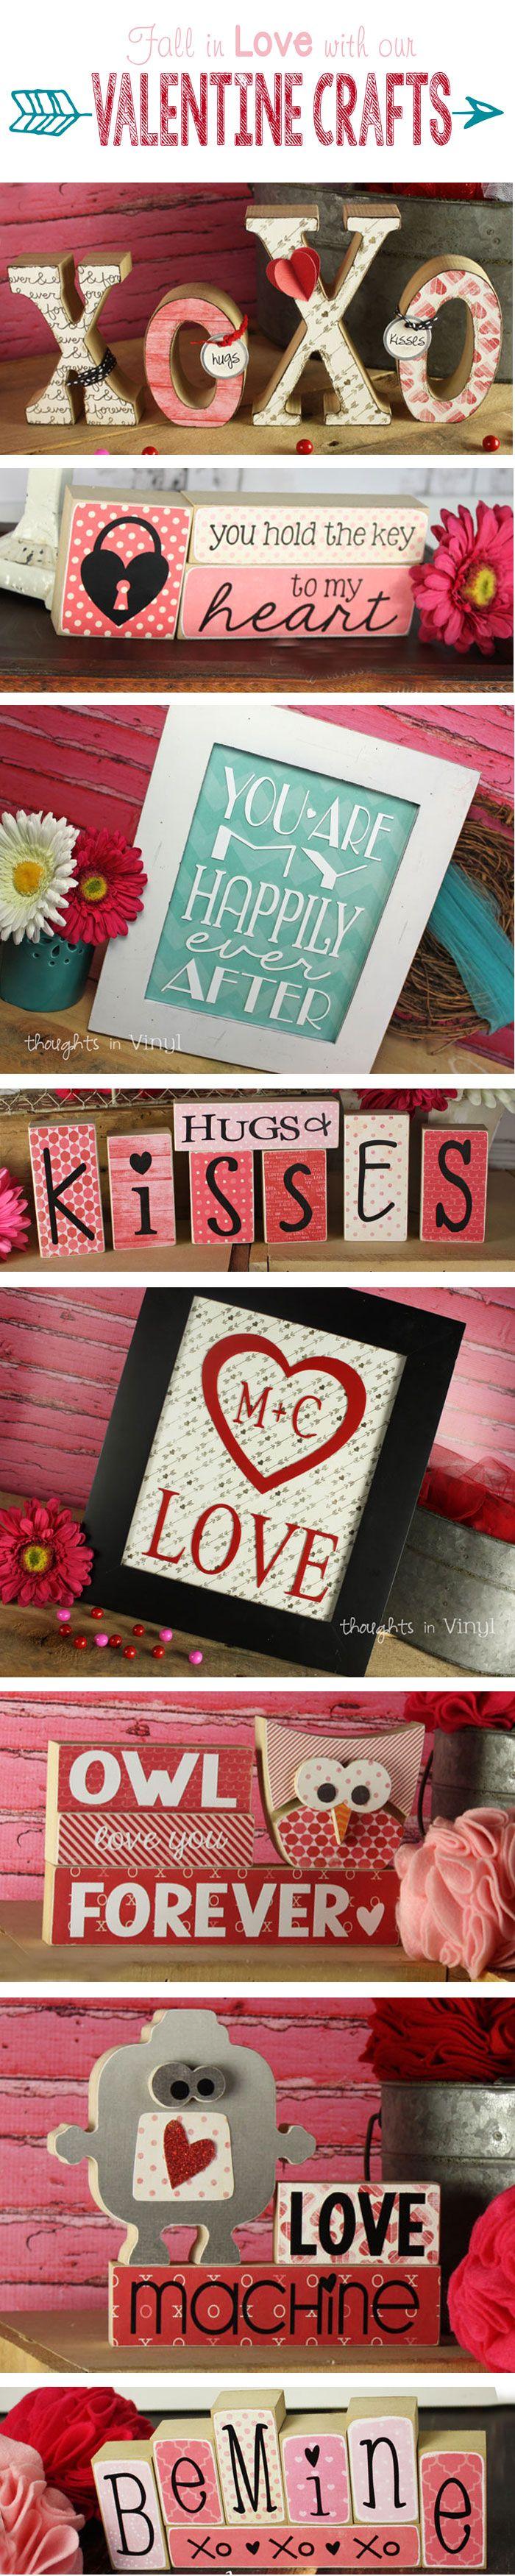 15 Pins om Cute Valentine Quotes du m se